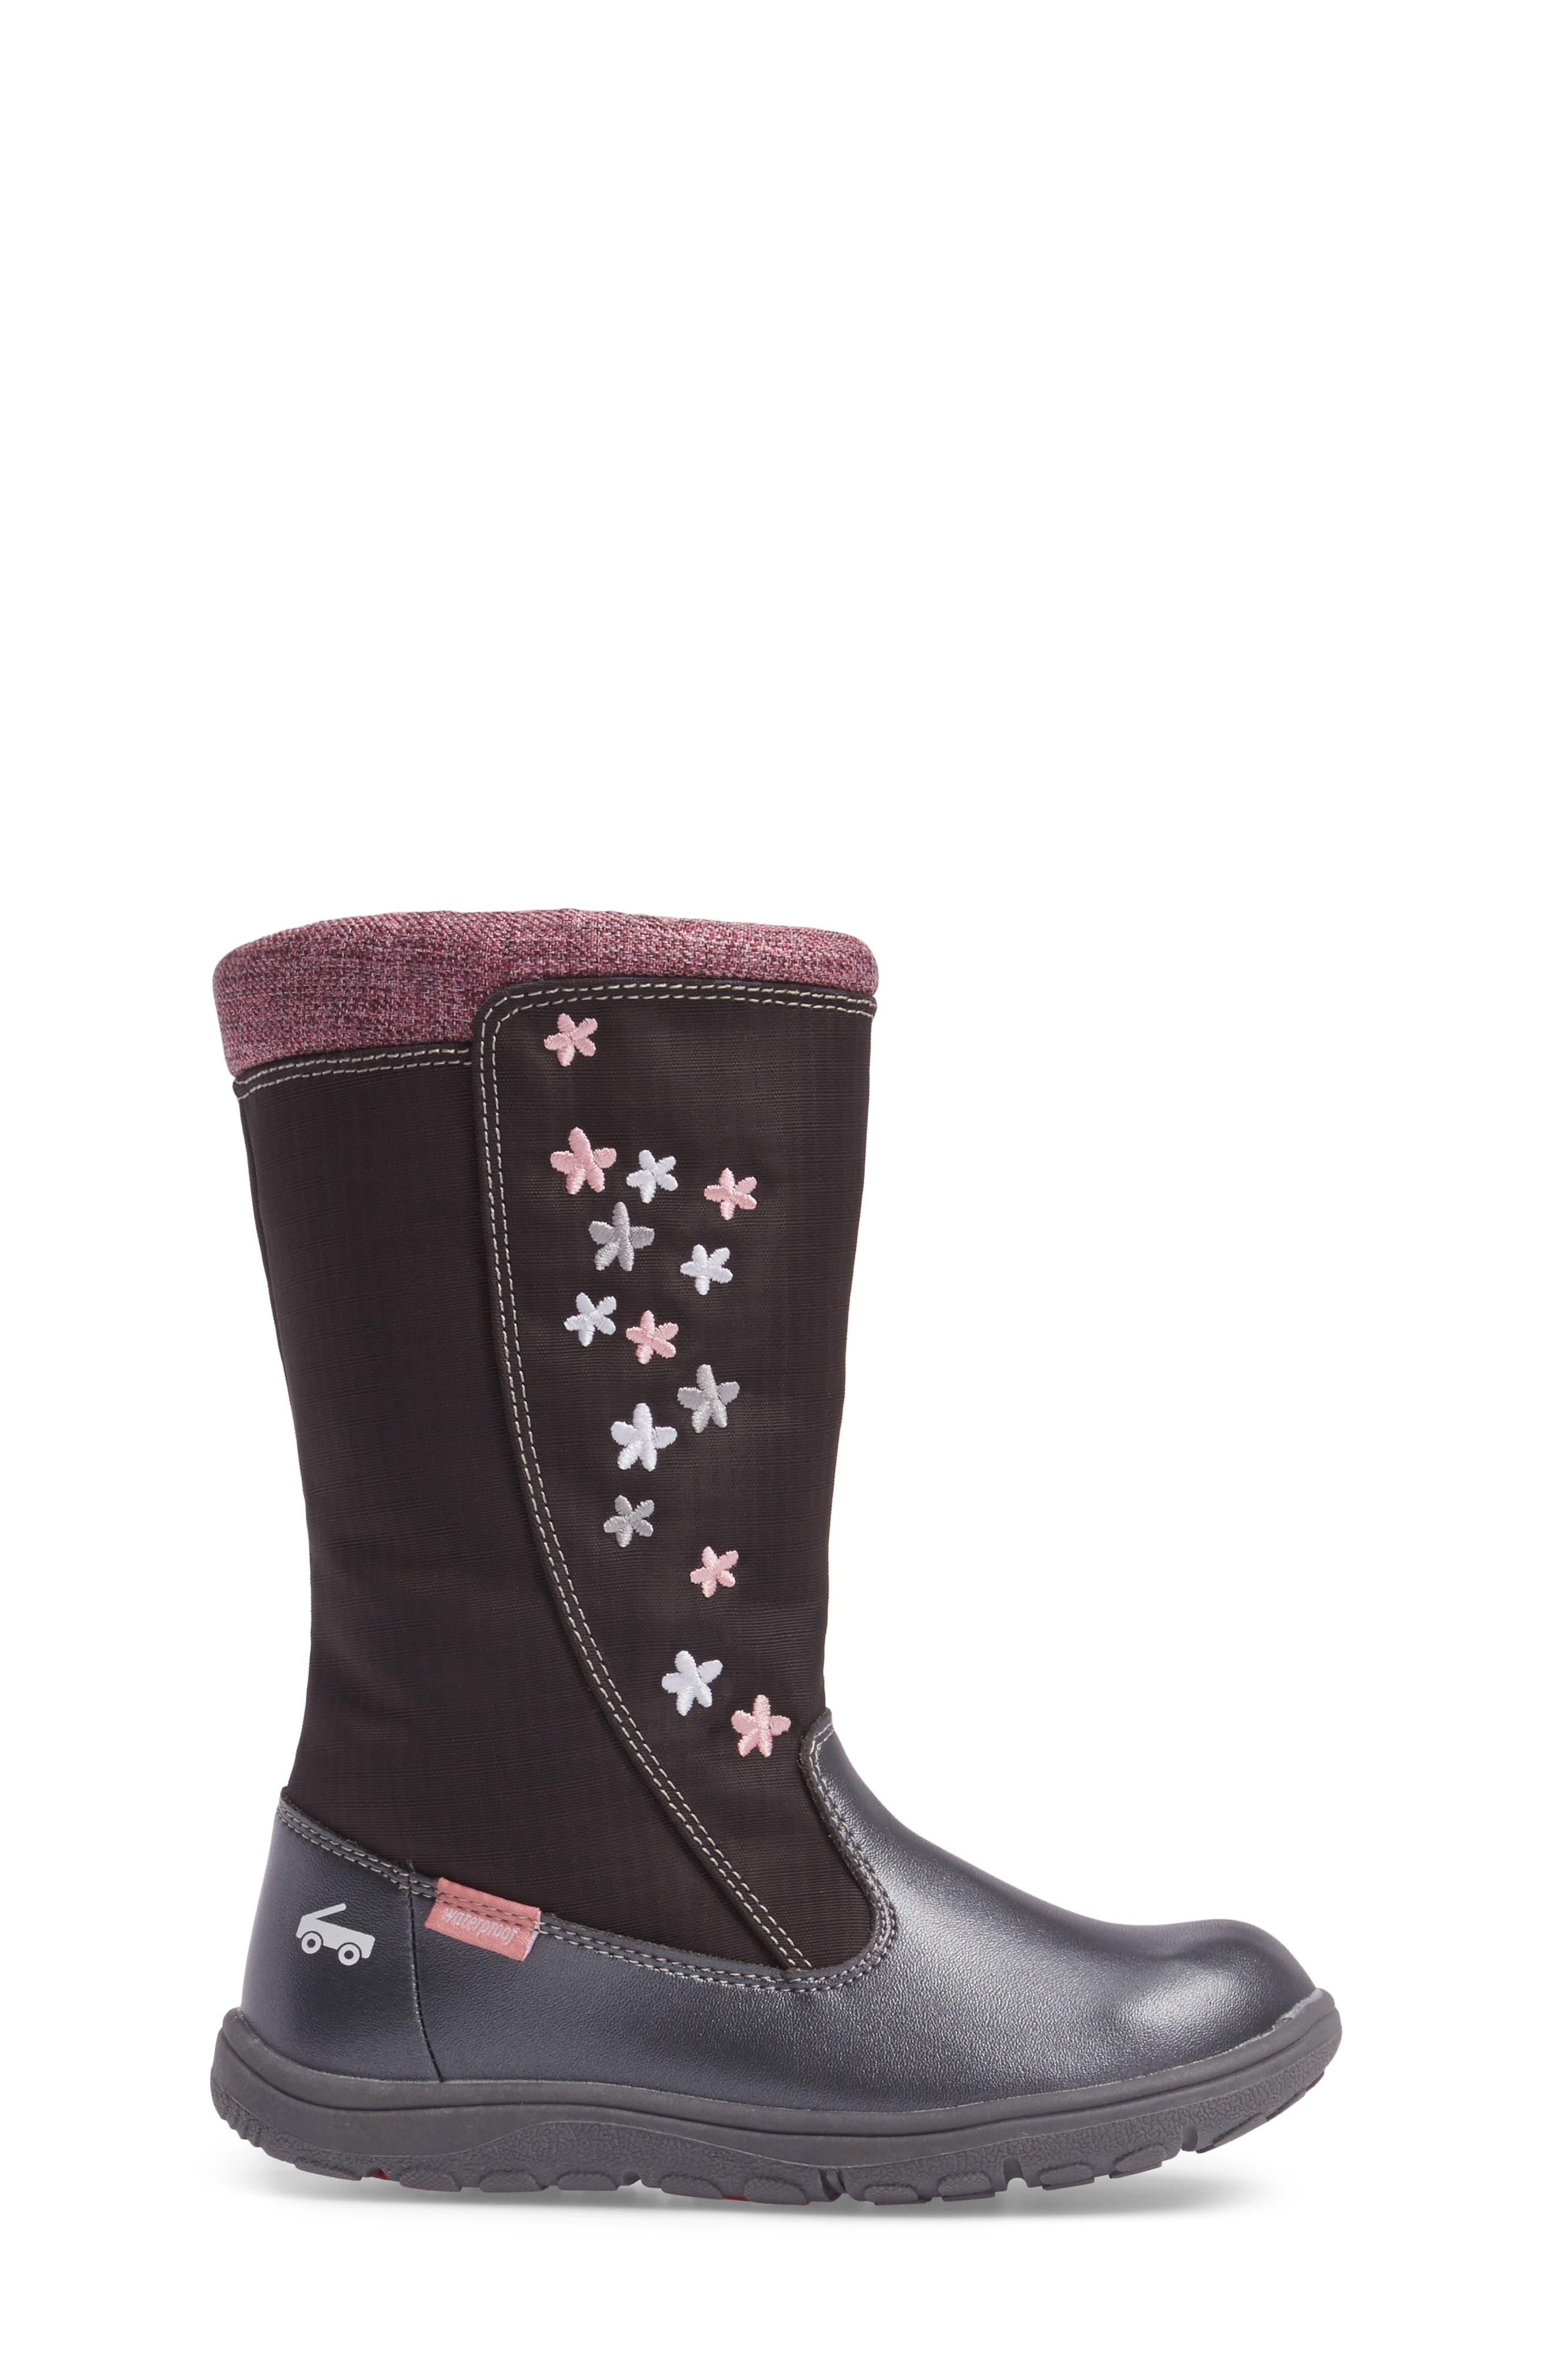 'Hallie' Waterproof Boot,                             Alternate thumbnail 3, color,                             021